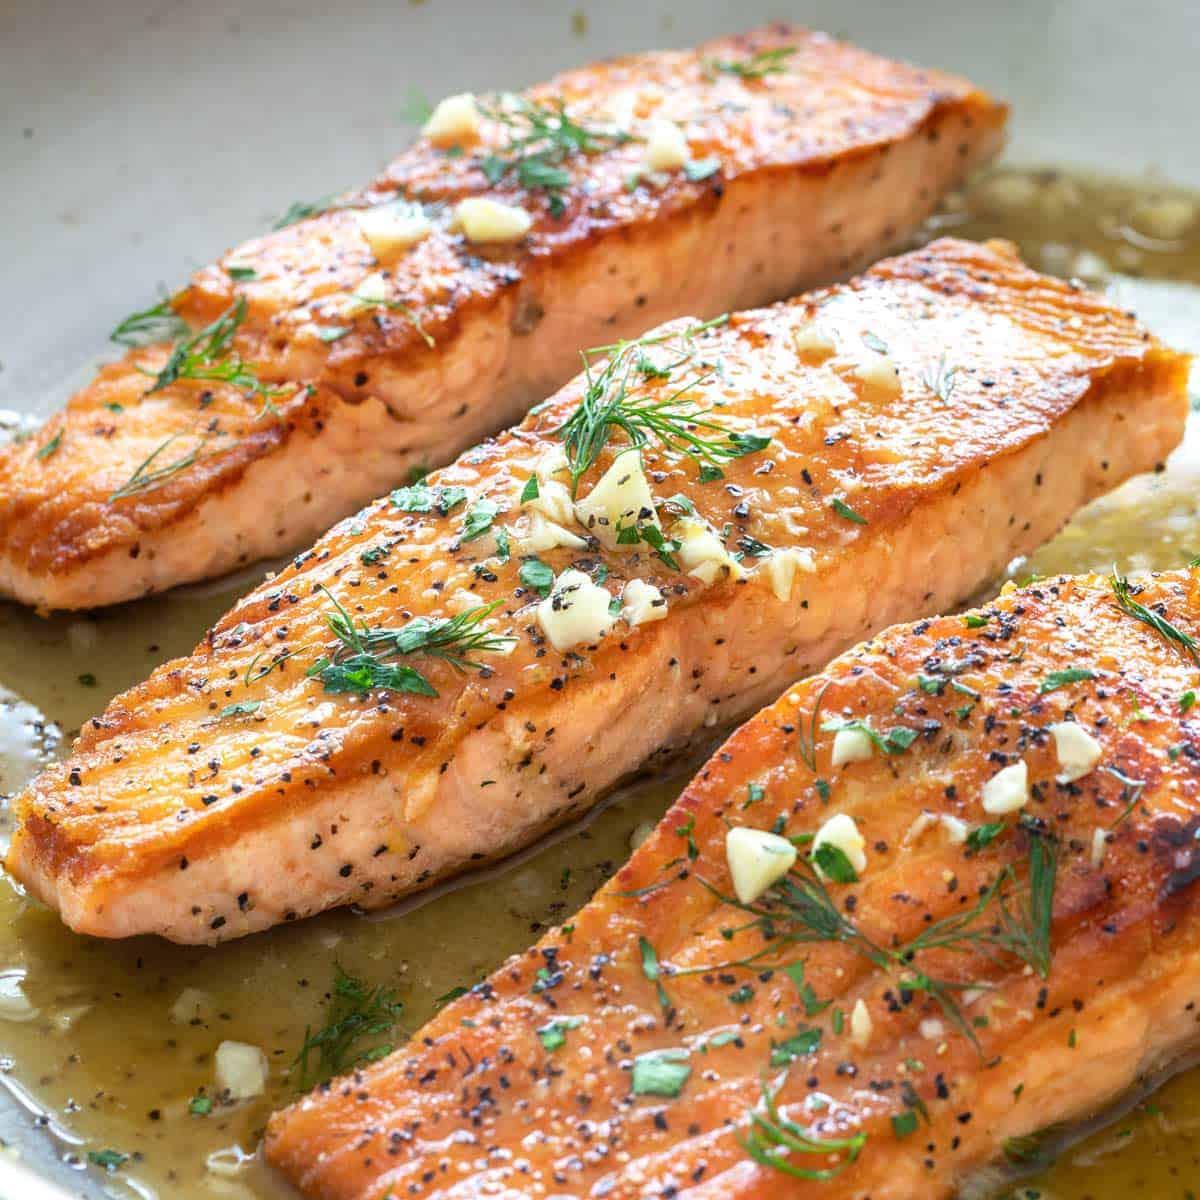 Pan-Seared Salmon with Lemon Garlic Sauce